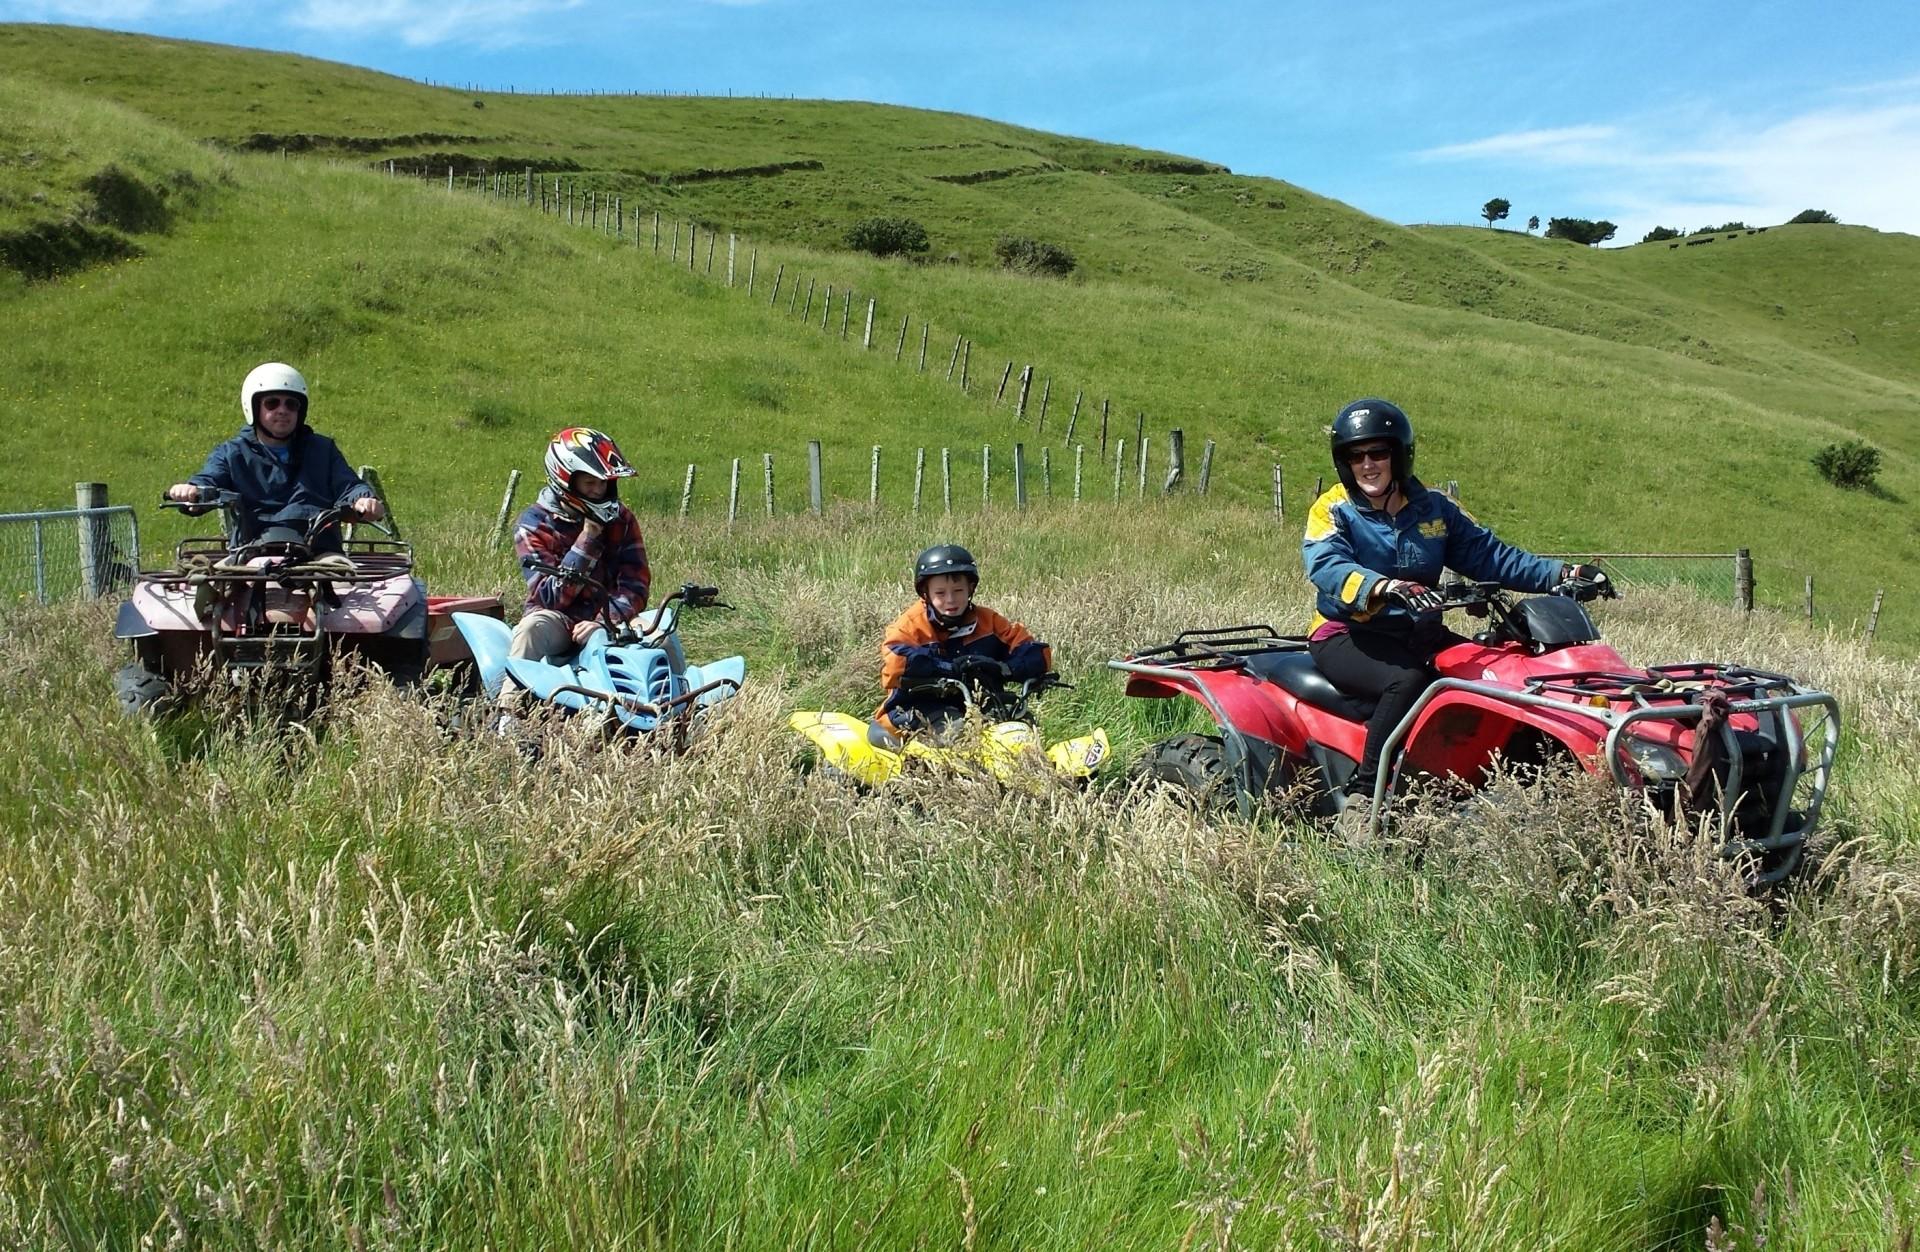 Quad excursion in the Menotre valley